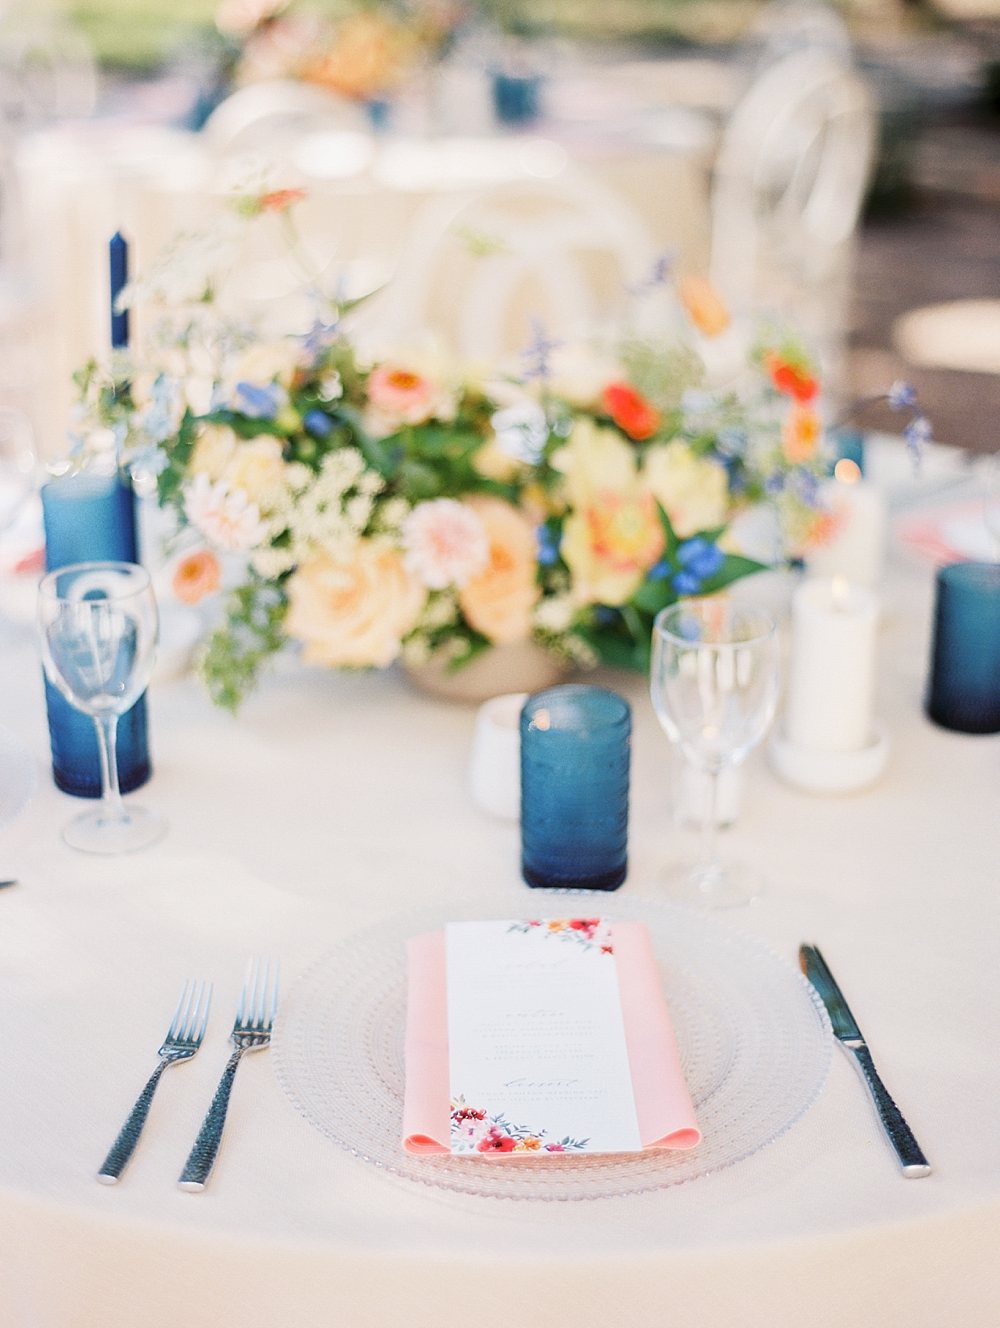 Kristin-La-Voie-Photography-Austin-Wedding-Photographer-the-grand-lady-27